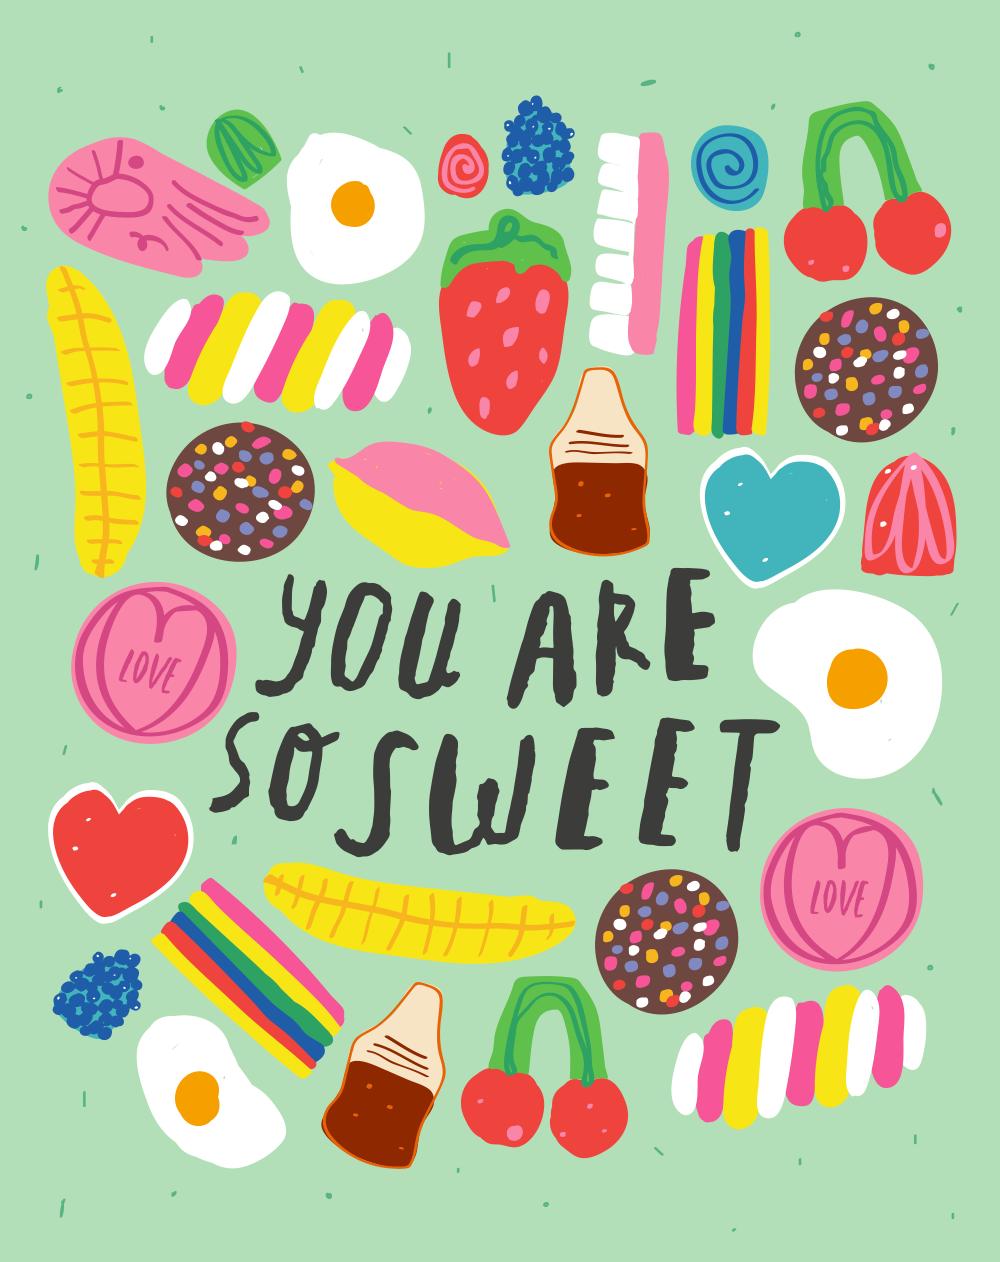 website sweets poster_Nikki Miles.png